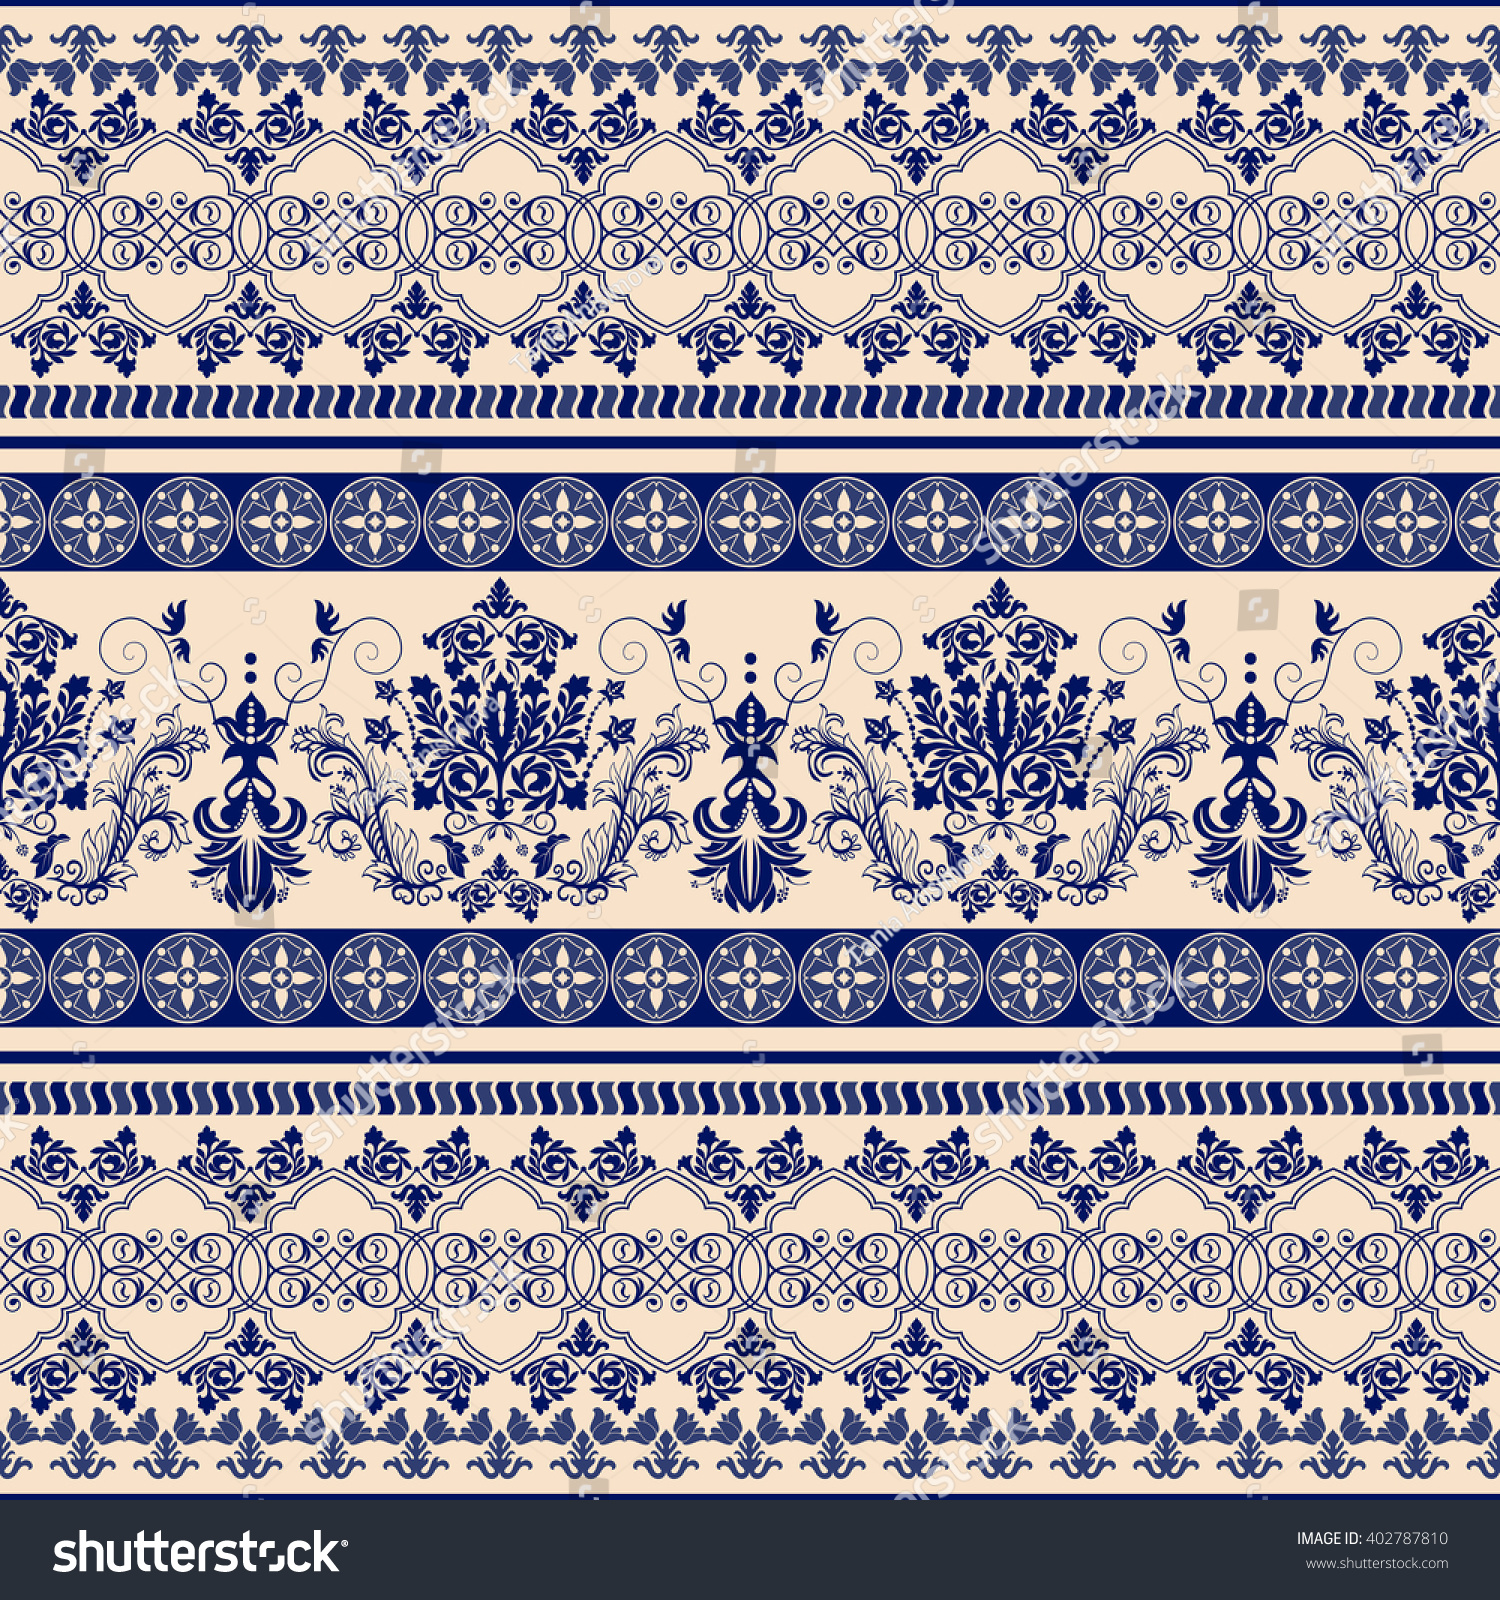 Seamless Damask Pattern Classic Wallpaper Background Ornamental Border